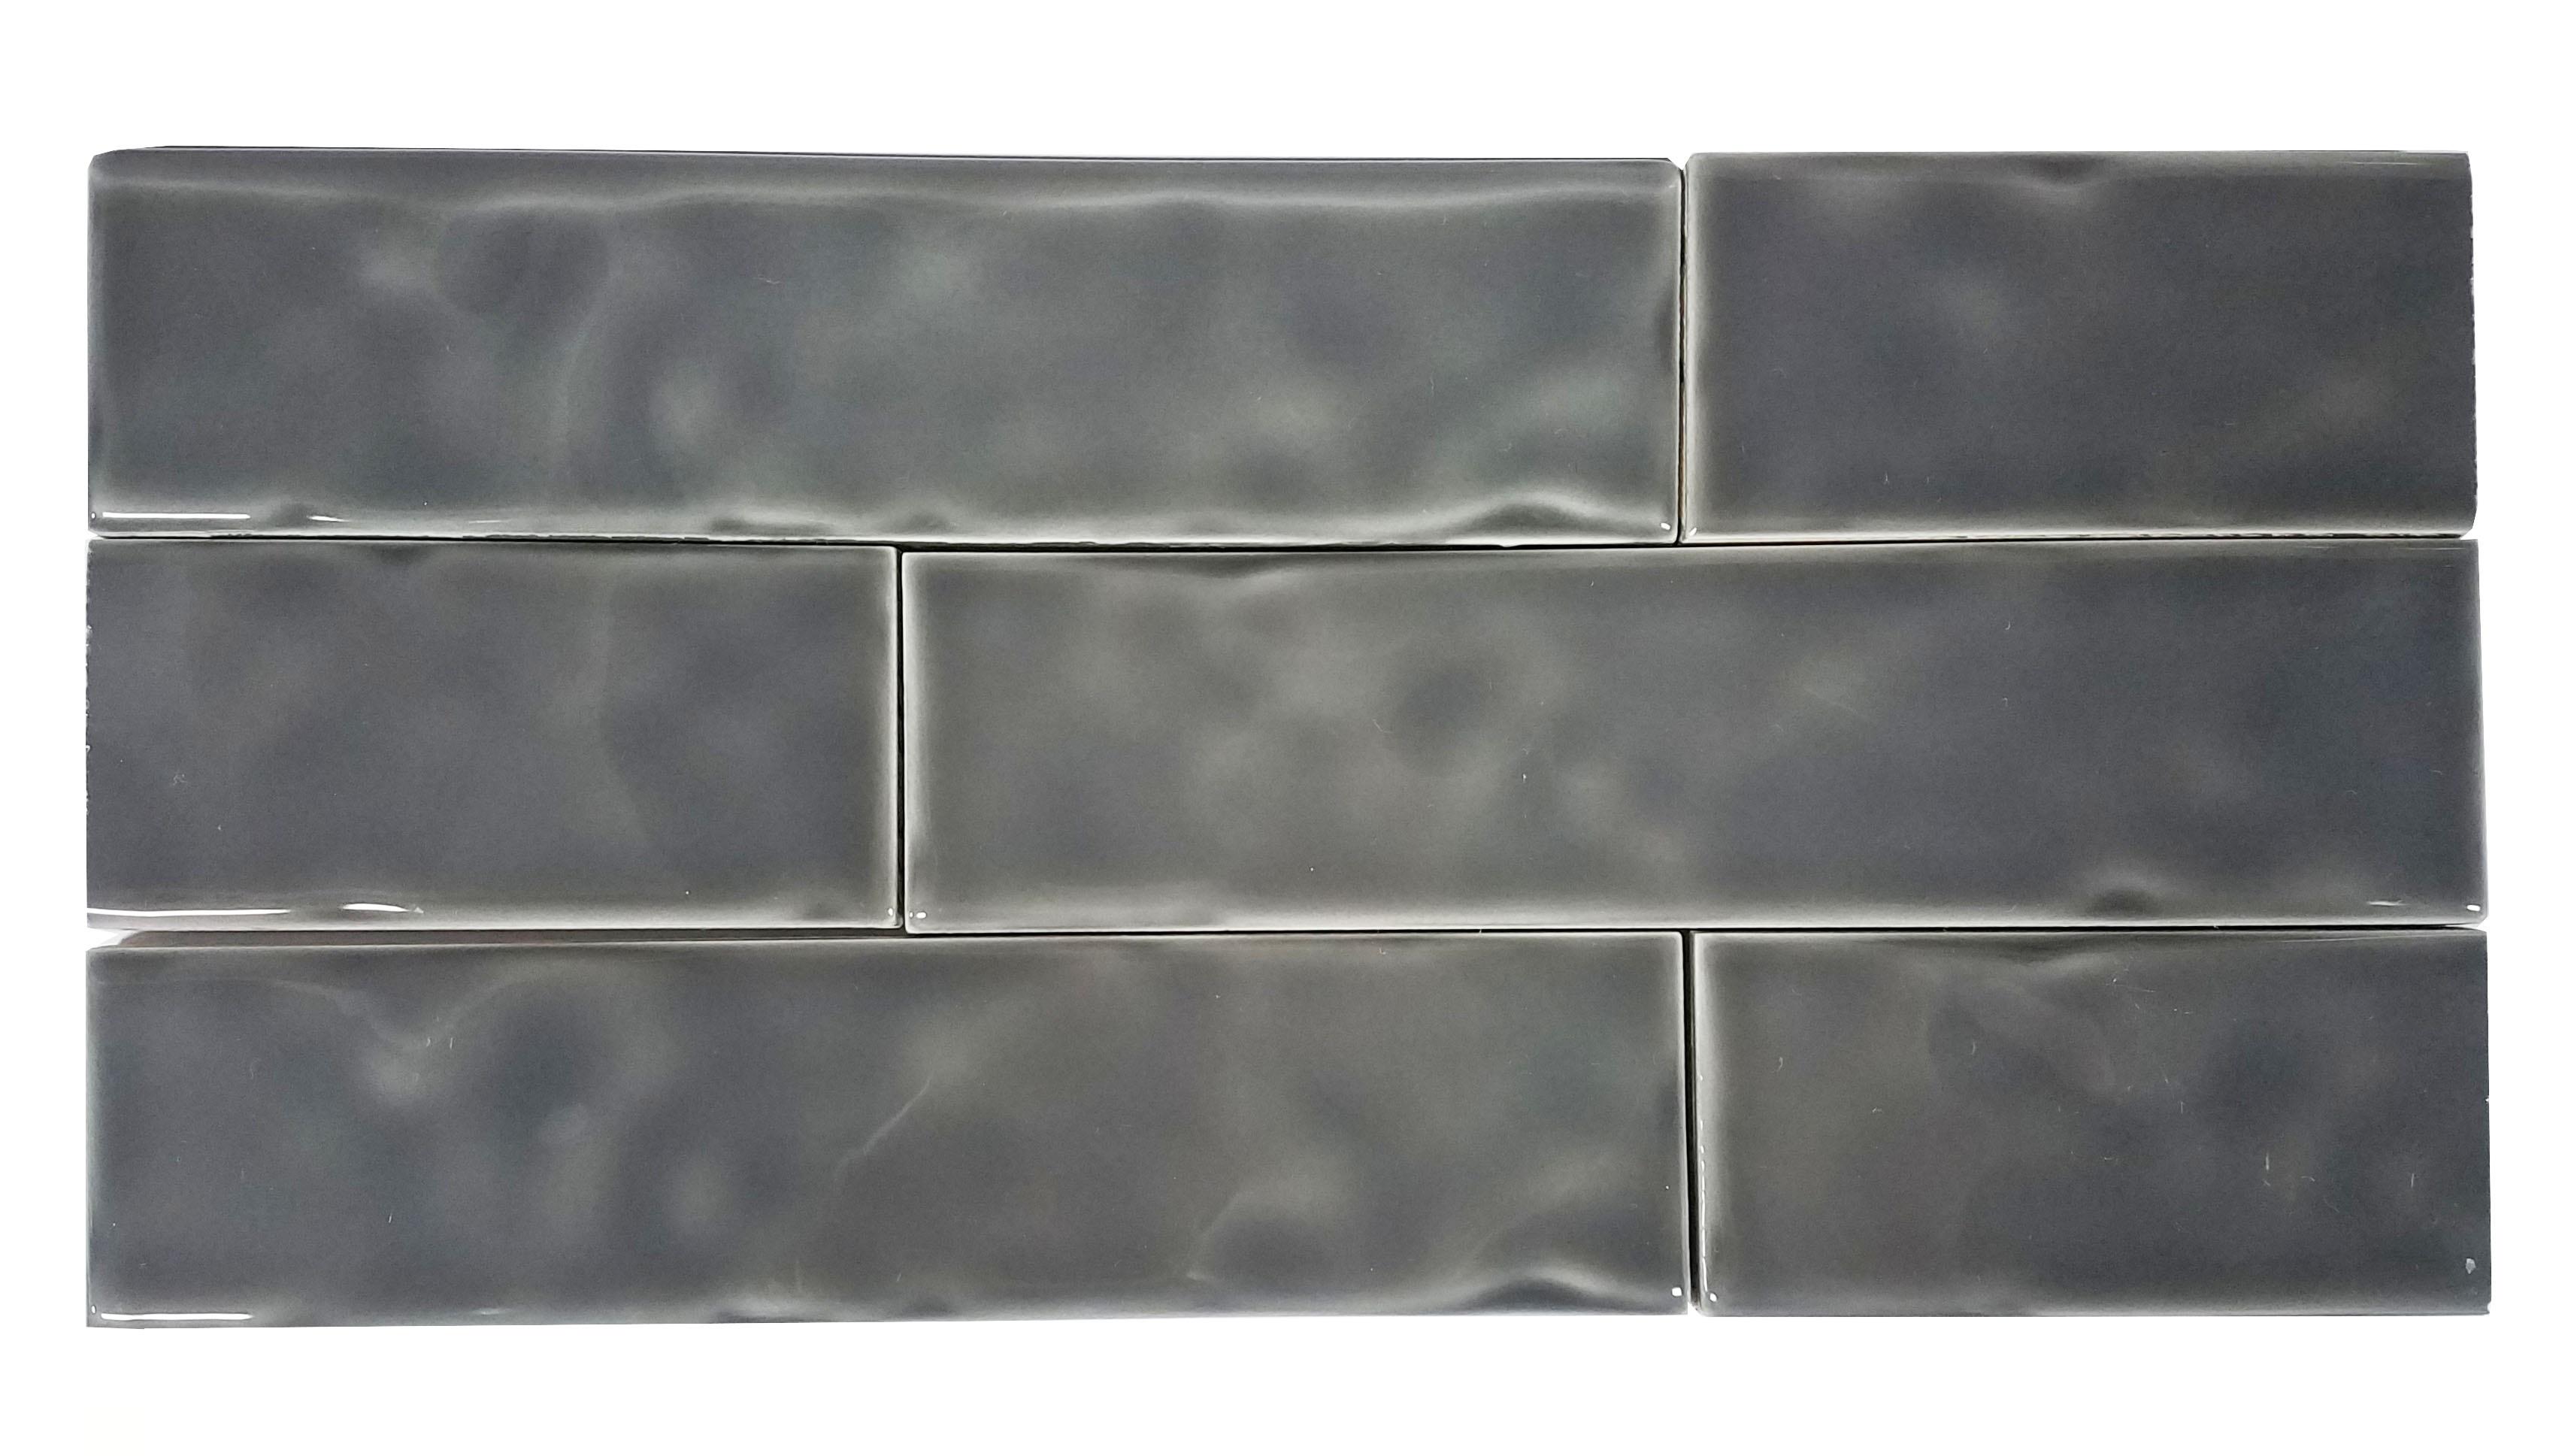 2 x 8 Chelsea Graphite Ceramic Wall subway